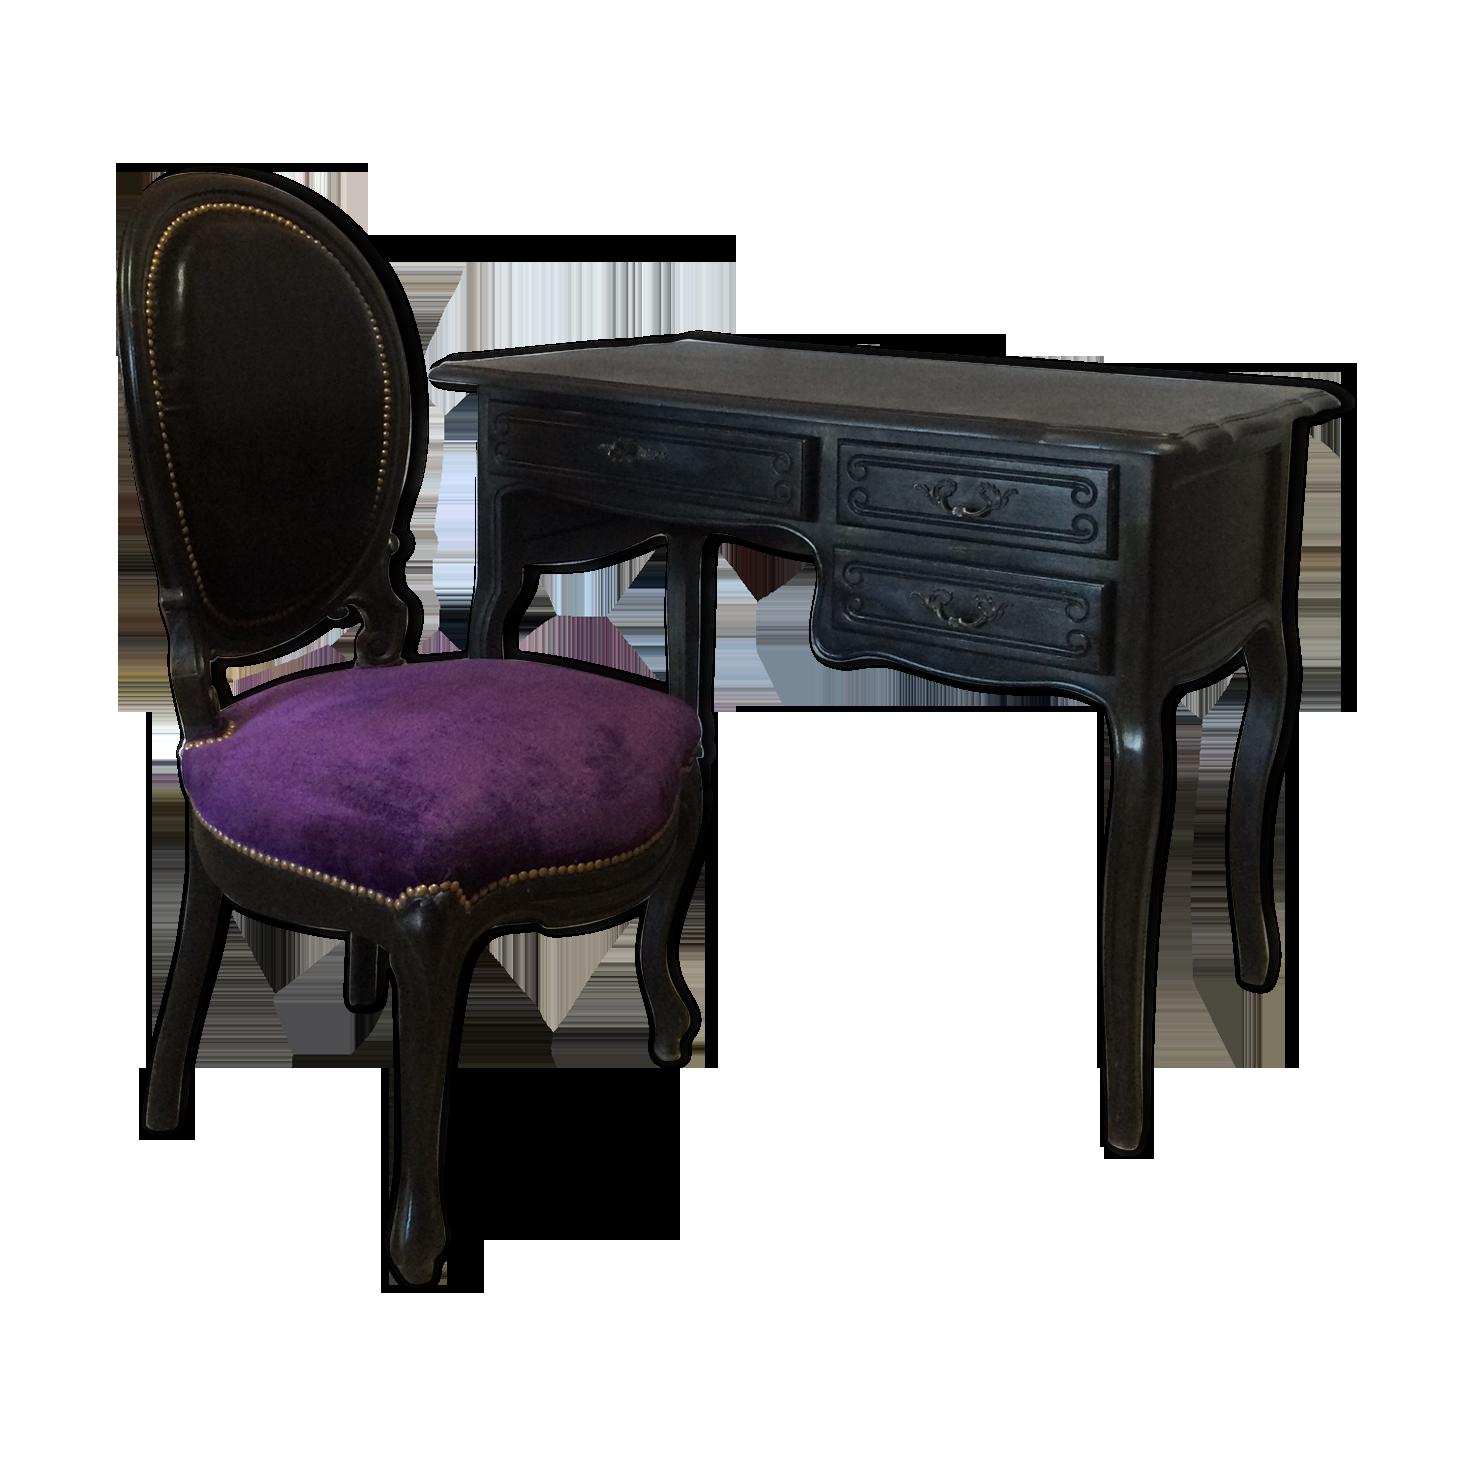 Bureau louis xv noir avec sa chaise médaillon bois matériau